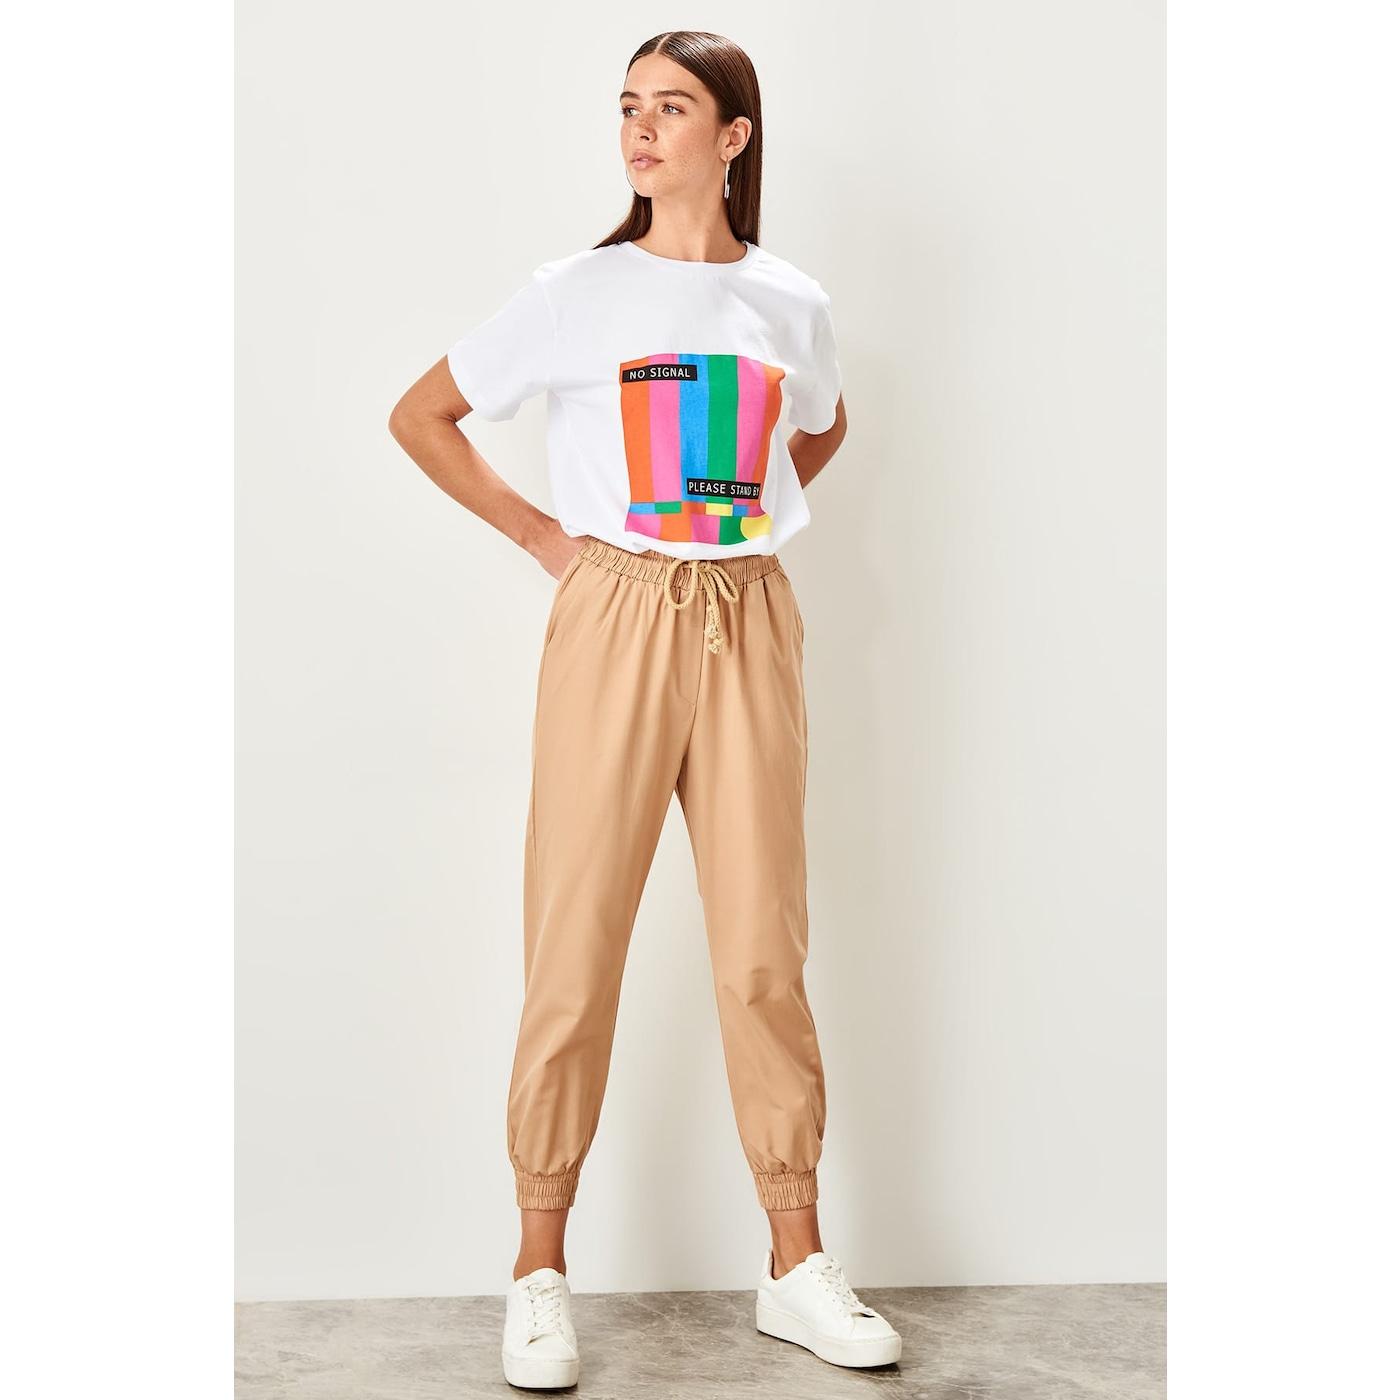 Trendyol Jogger trousers dámské Beige 38